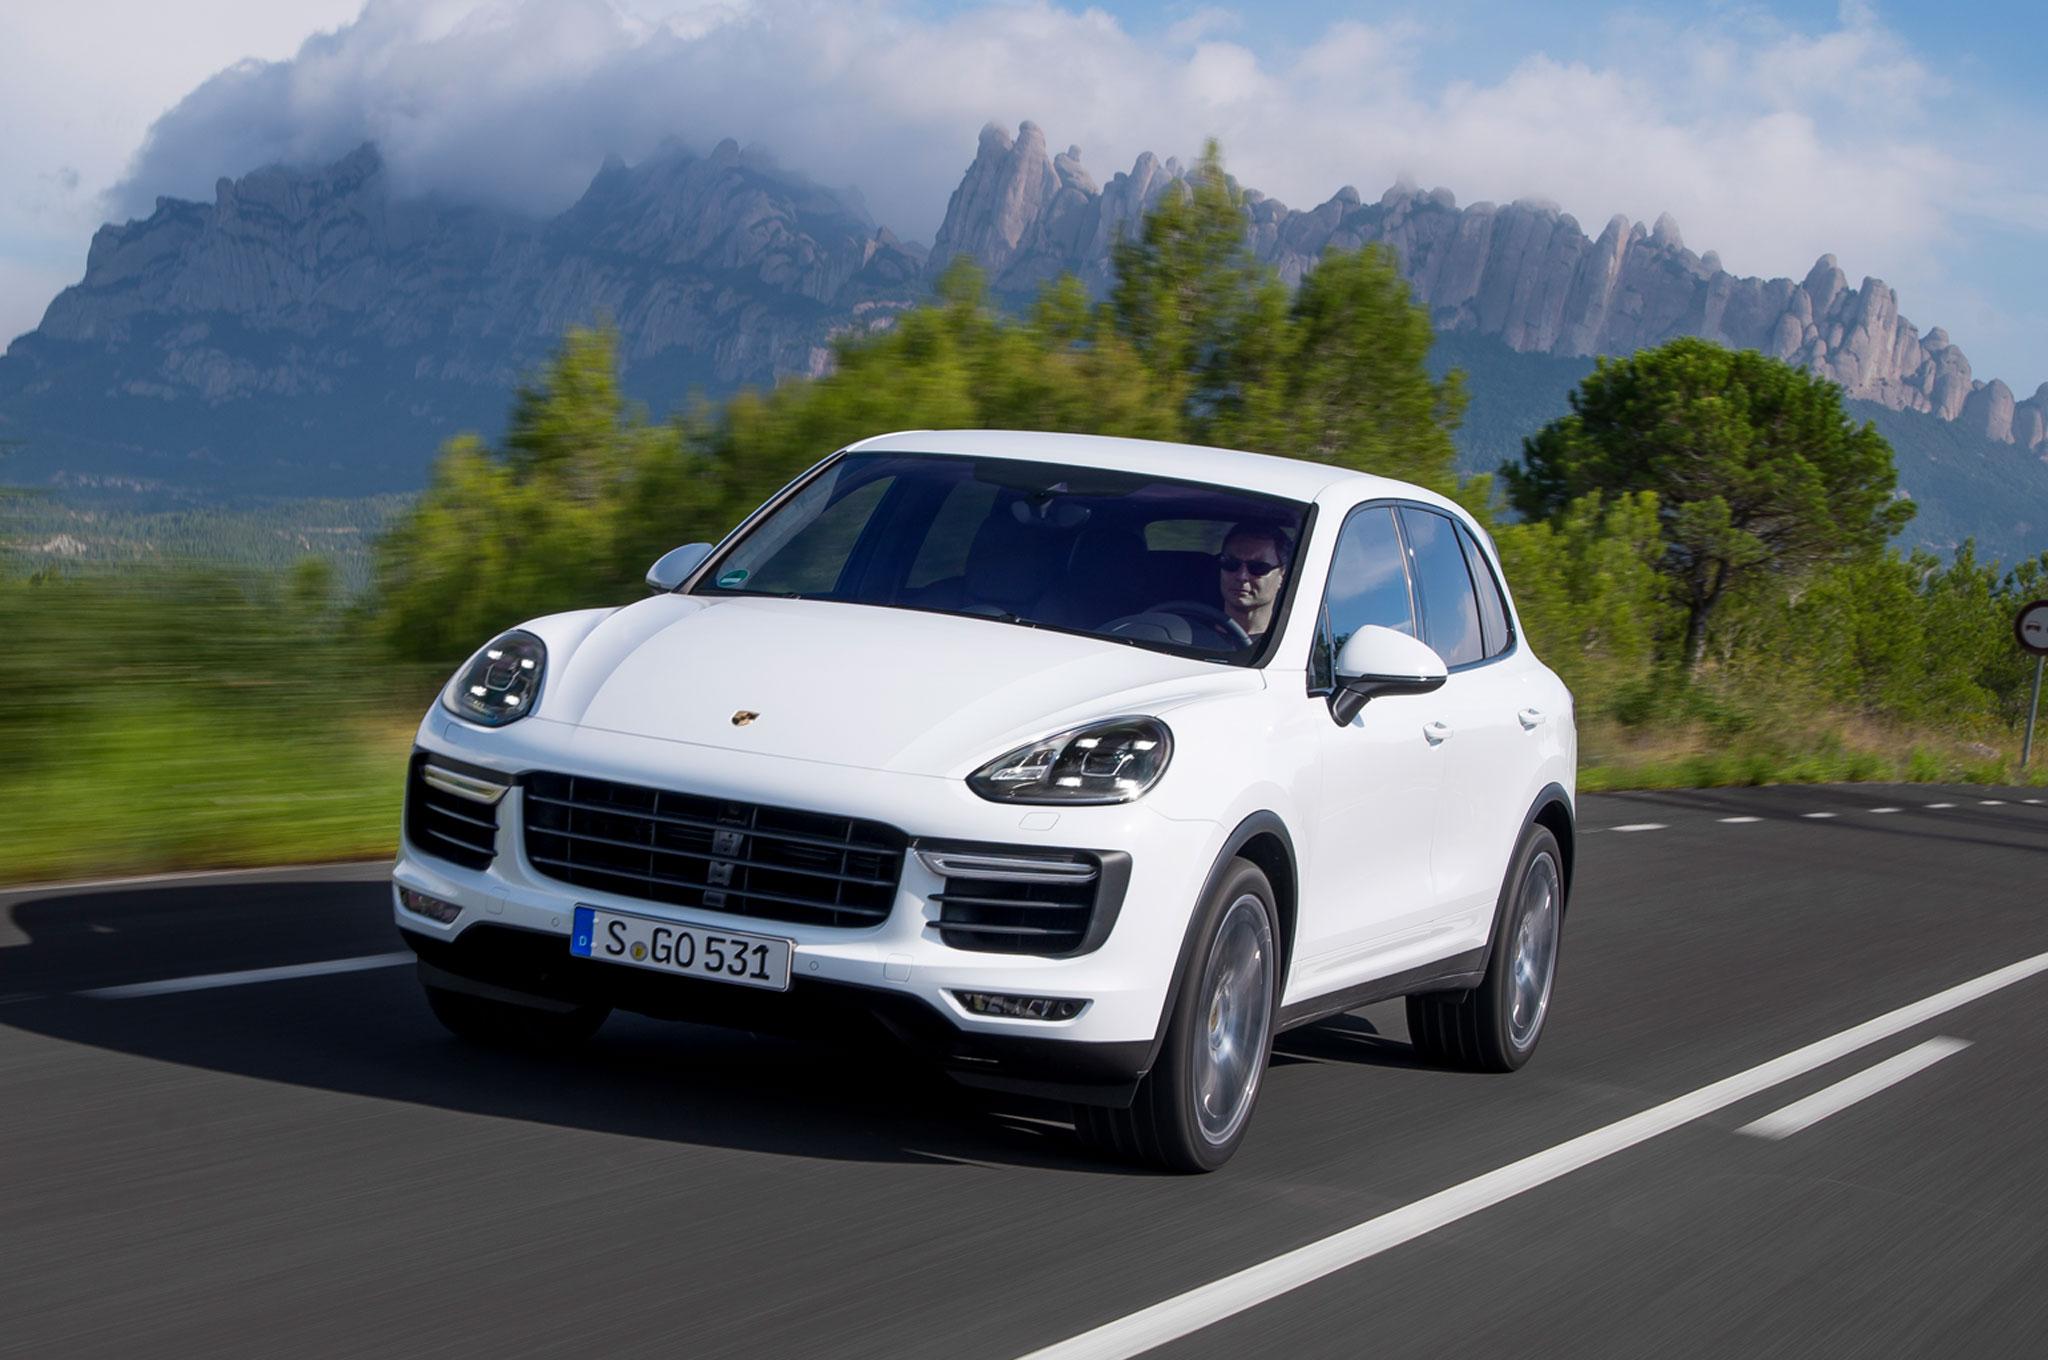 2015 porsche cayenne s turbo review - Porsche Cayenne Turbo White